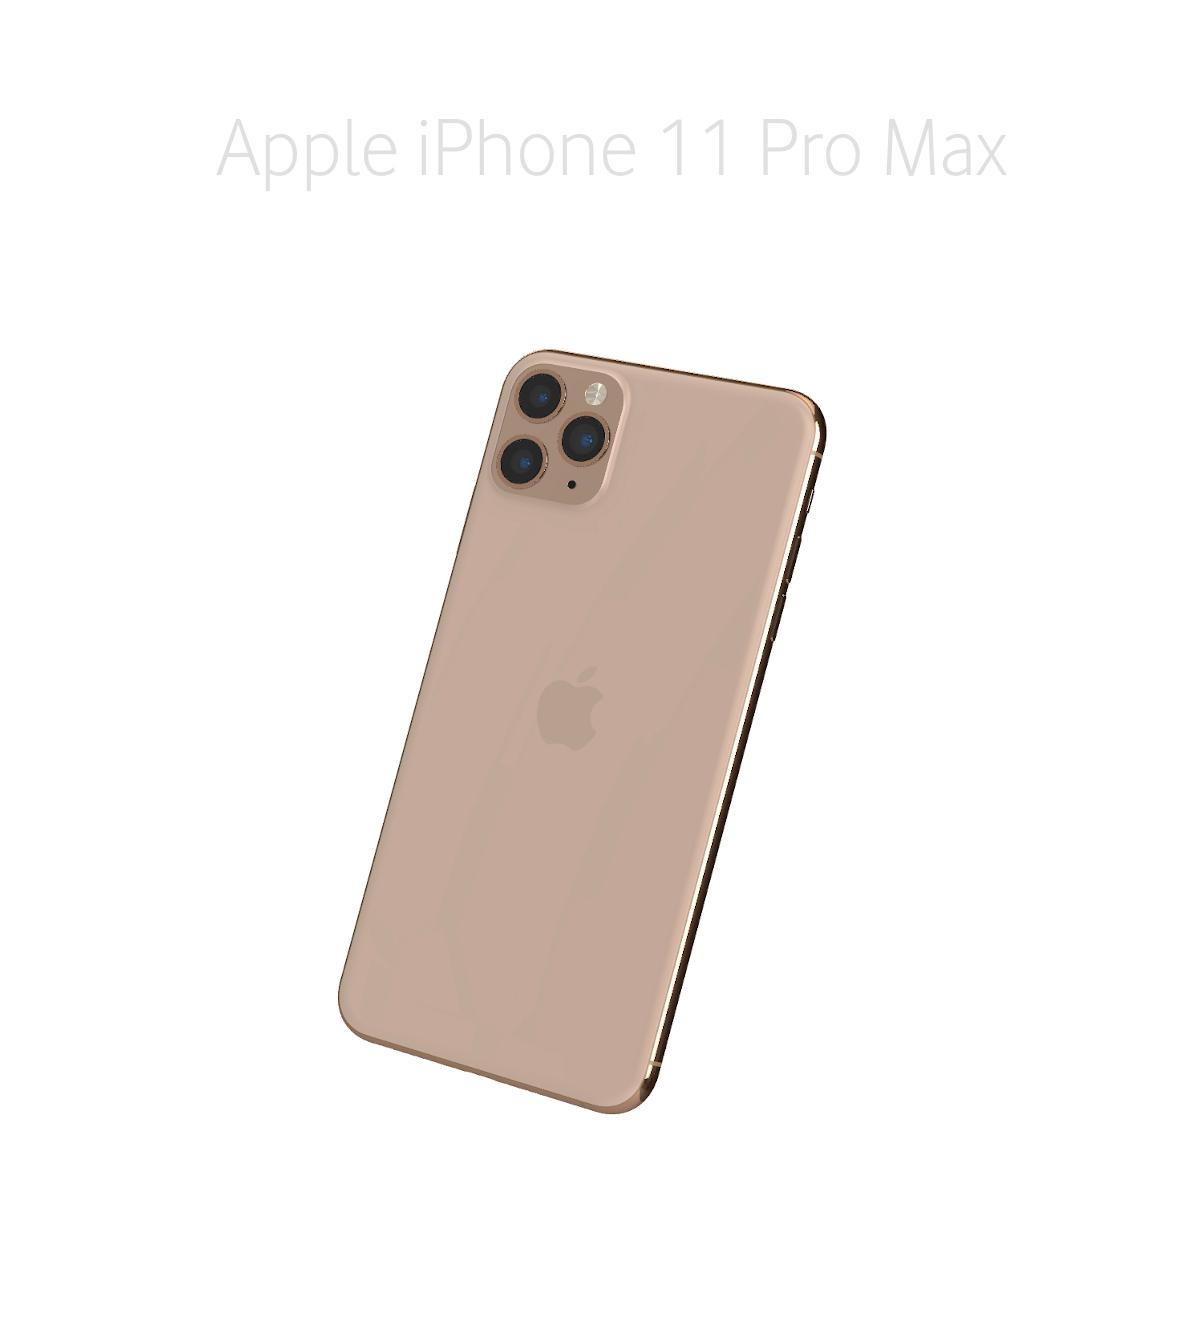 Laga glas/baksida iPhone 11 Pro Max